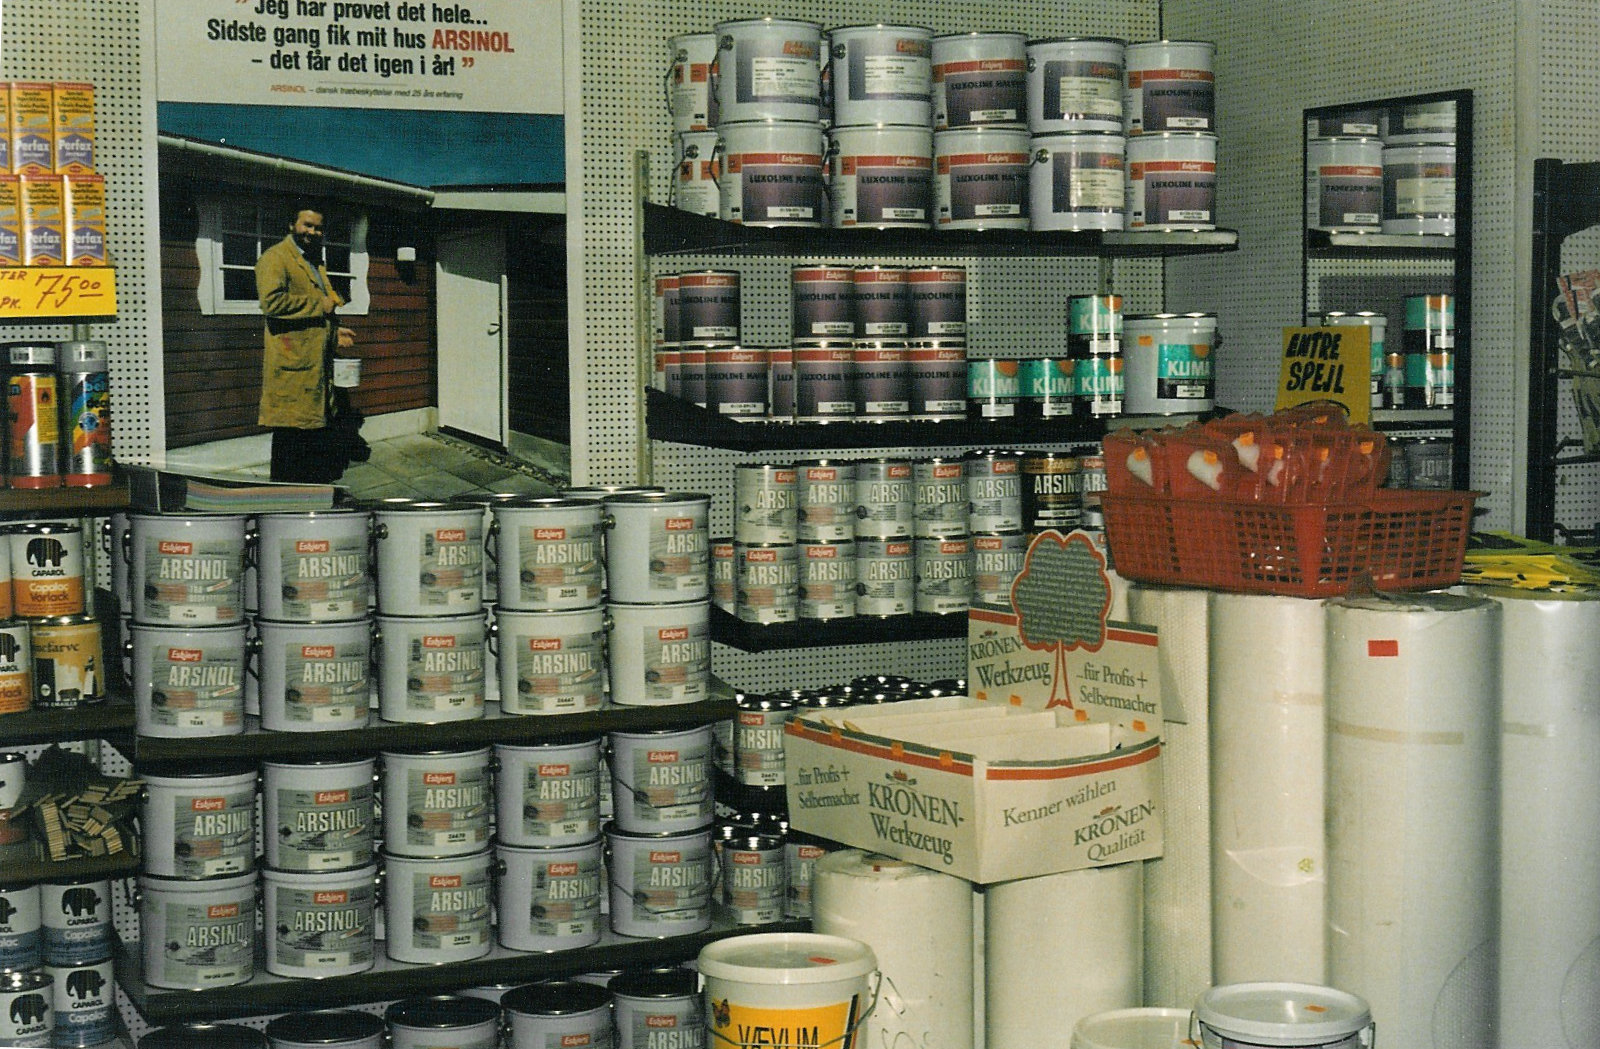 Tapetbutikken med maling i spandevis